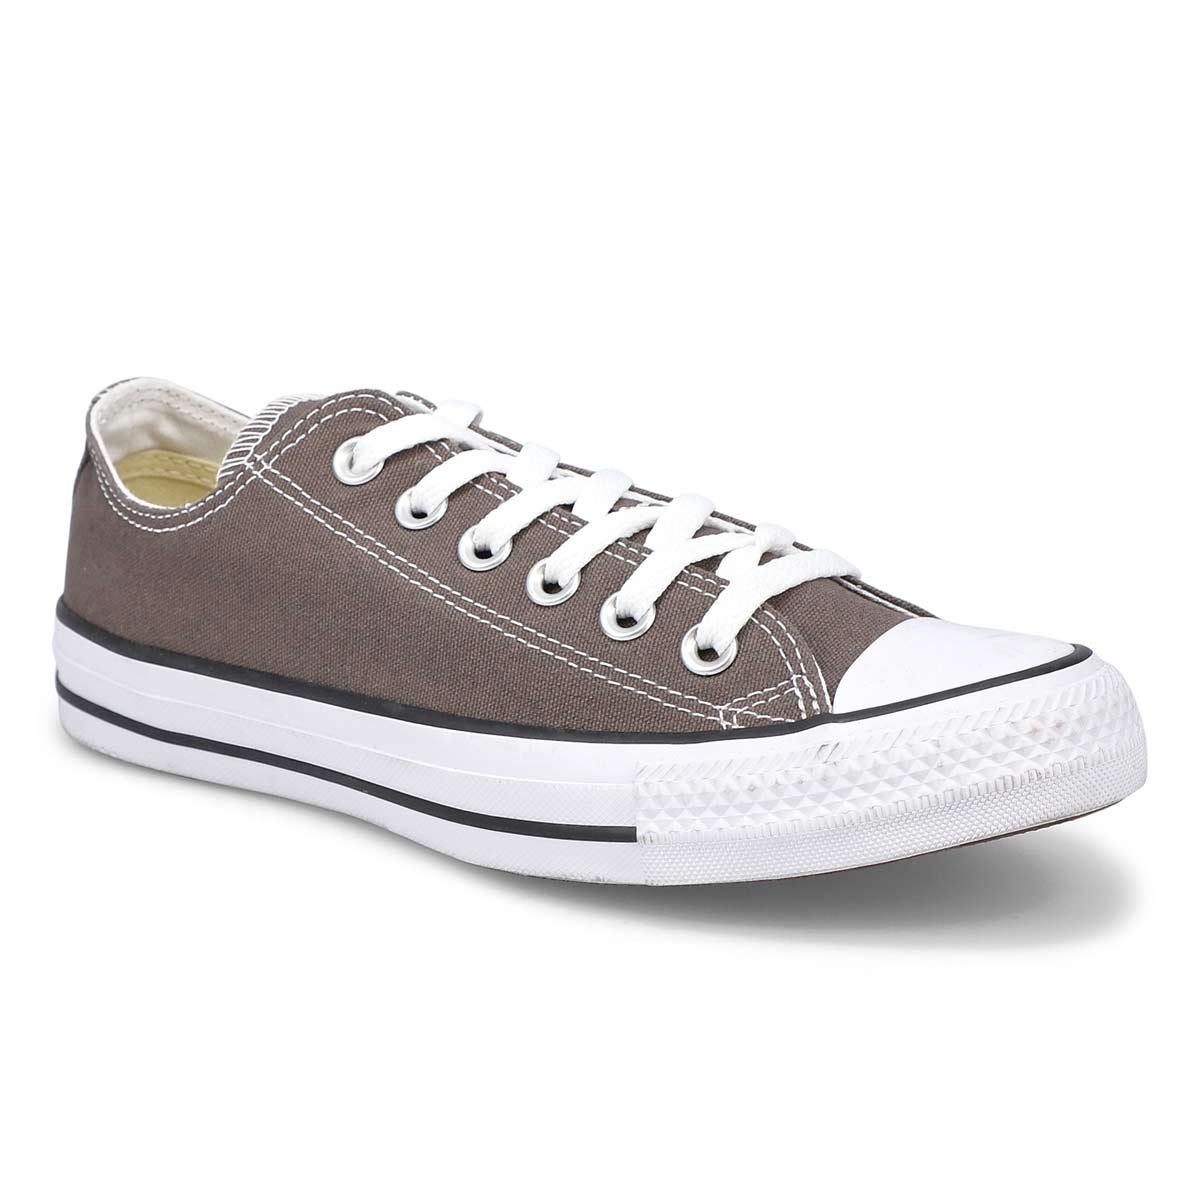 Women's Chuck Taylor All Star Sneaker - Grey